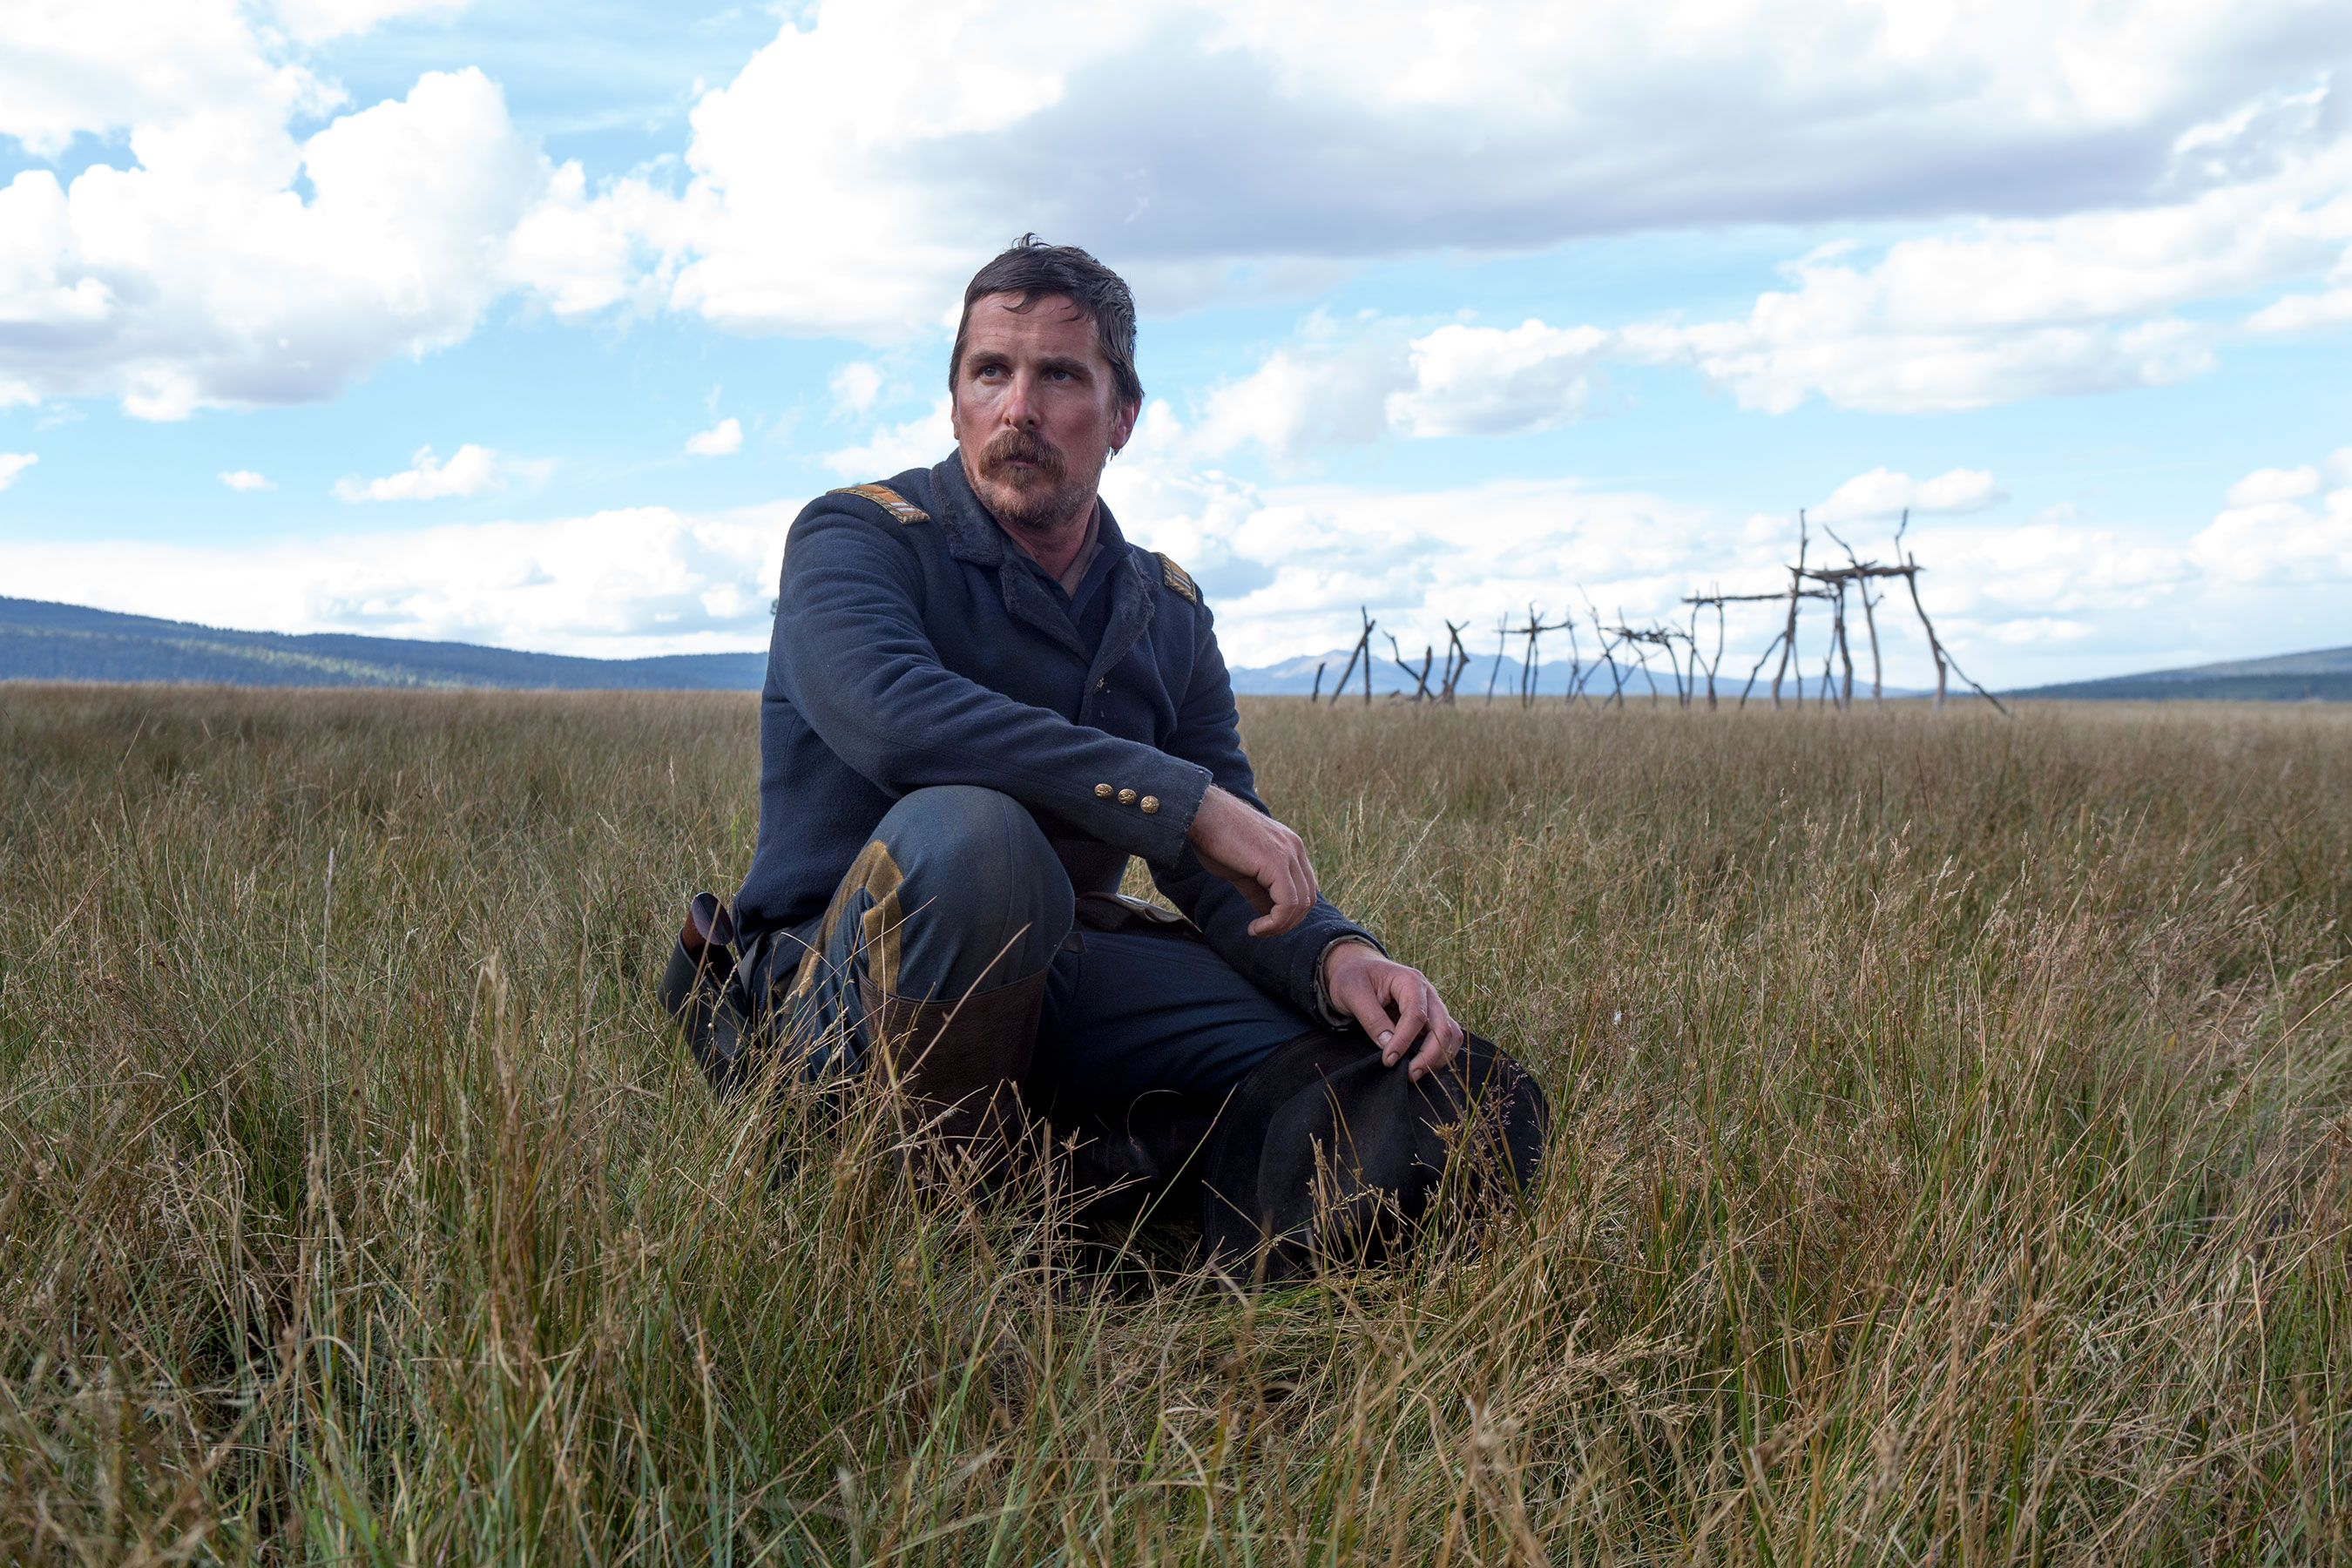 Telluride: Gary Oldman, Christian Bale get jump on Oscar competition